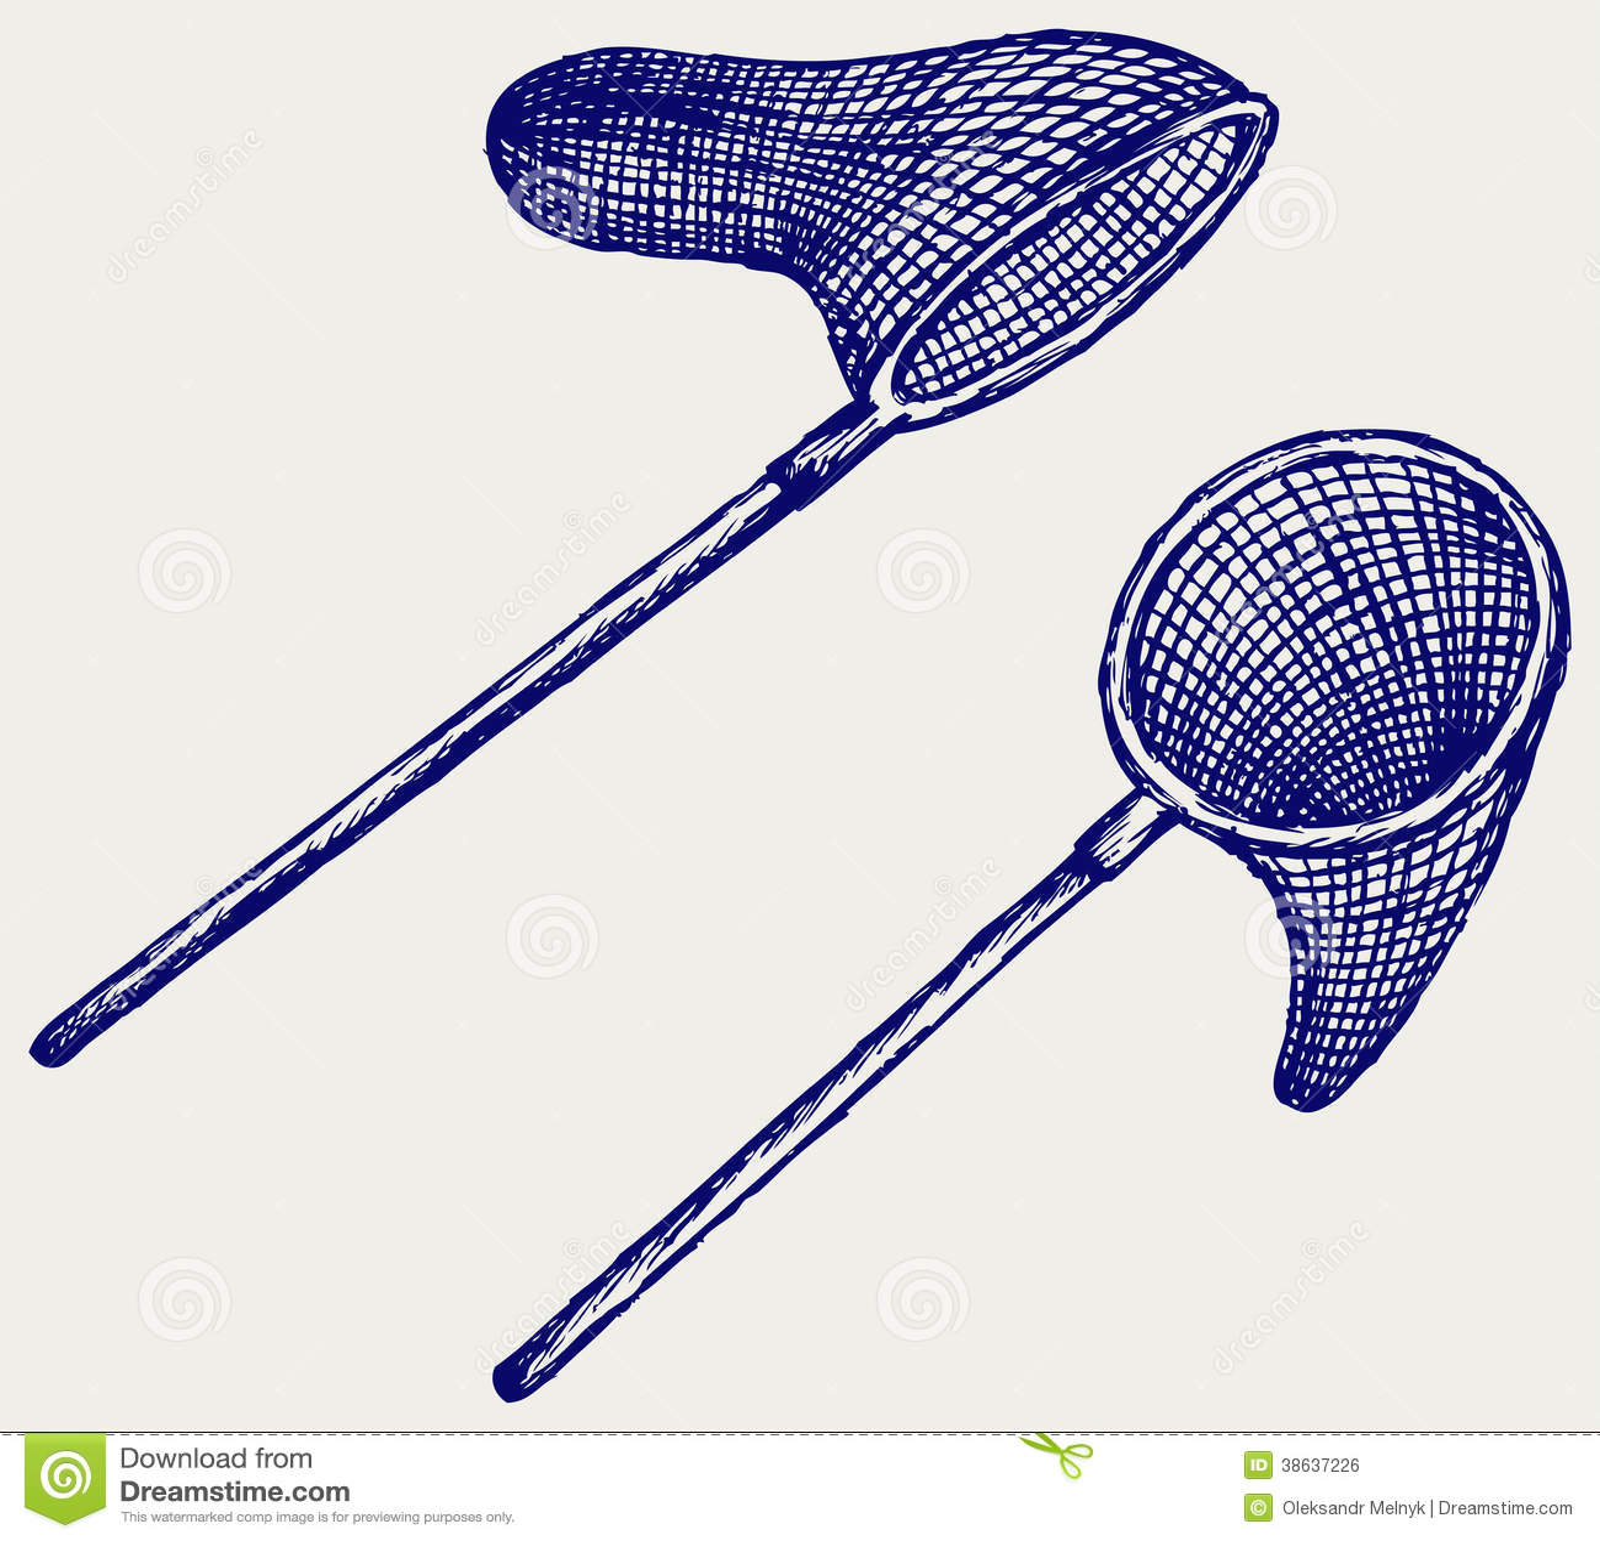 fishing net vector - photo #11